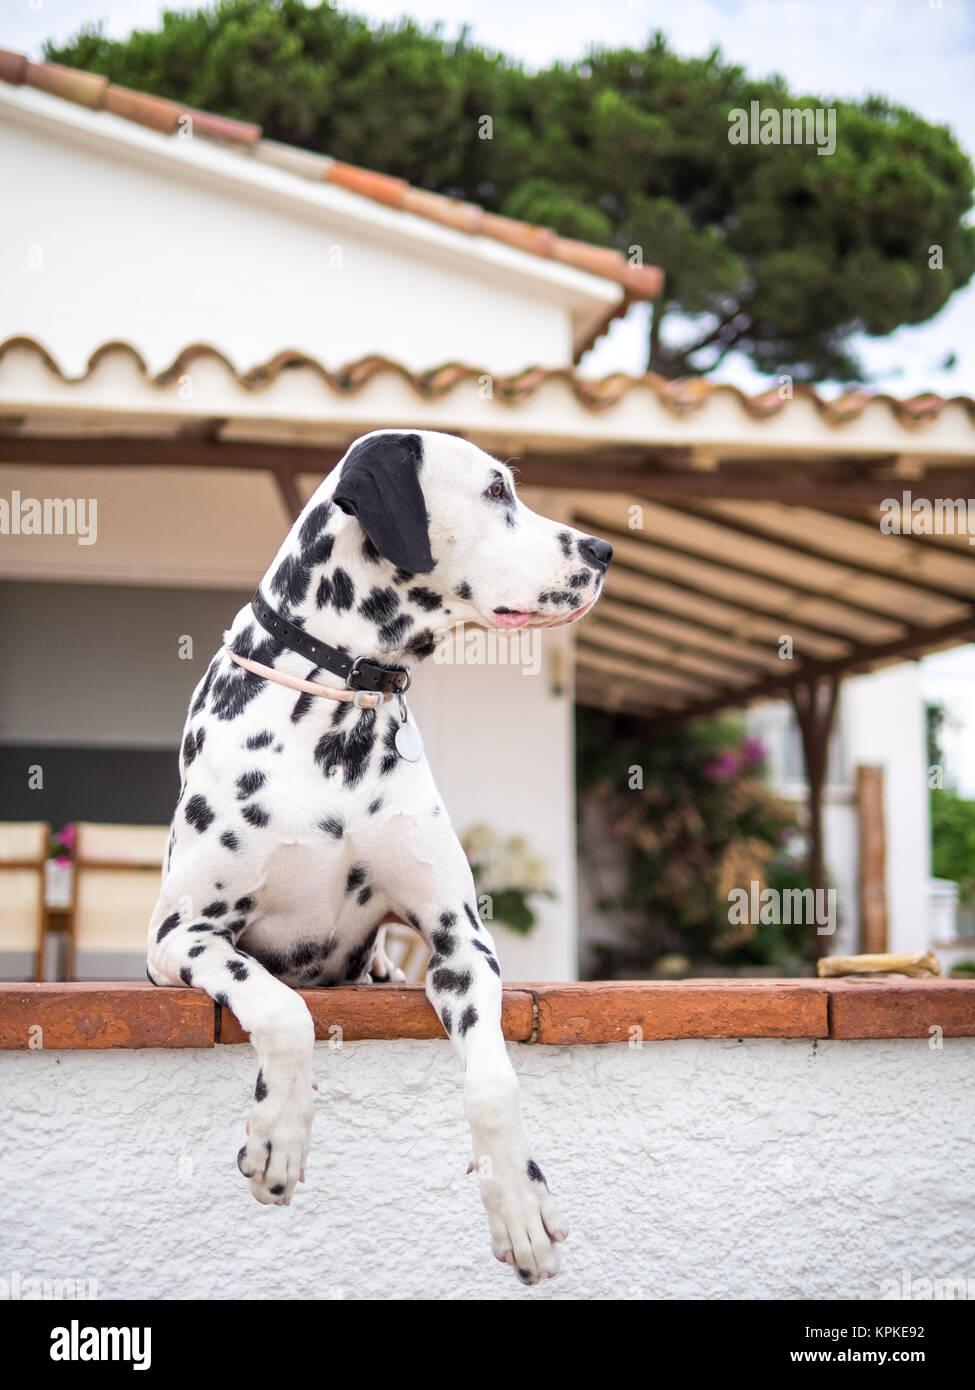 Dalmatian Keeper - Stock Image